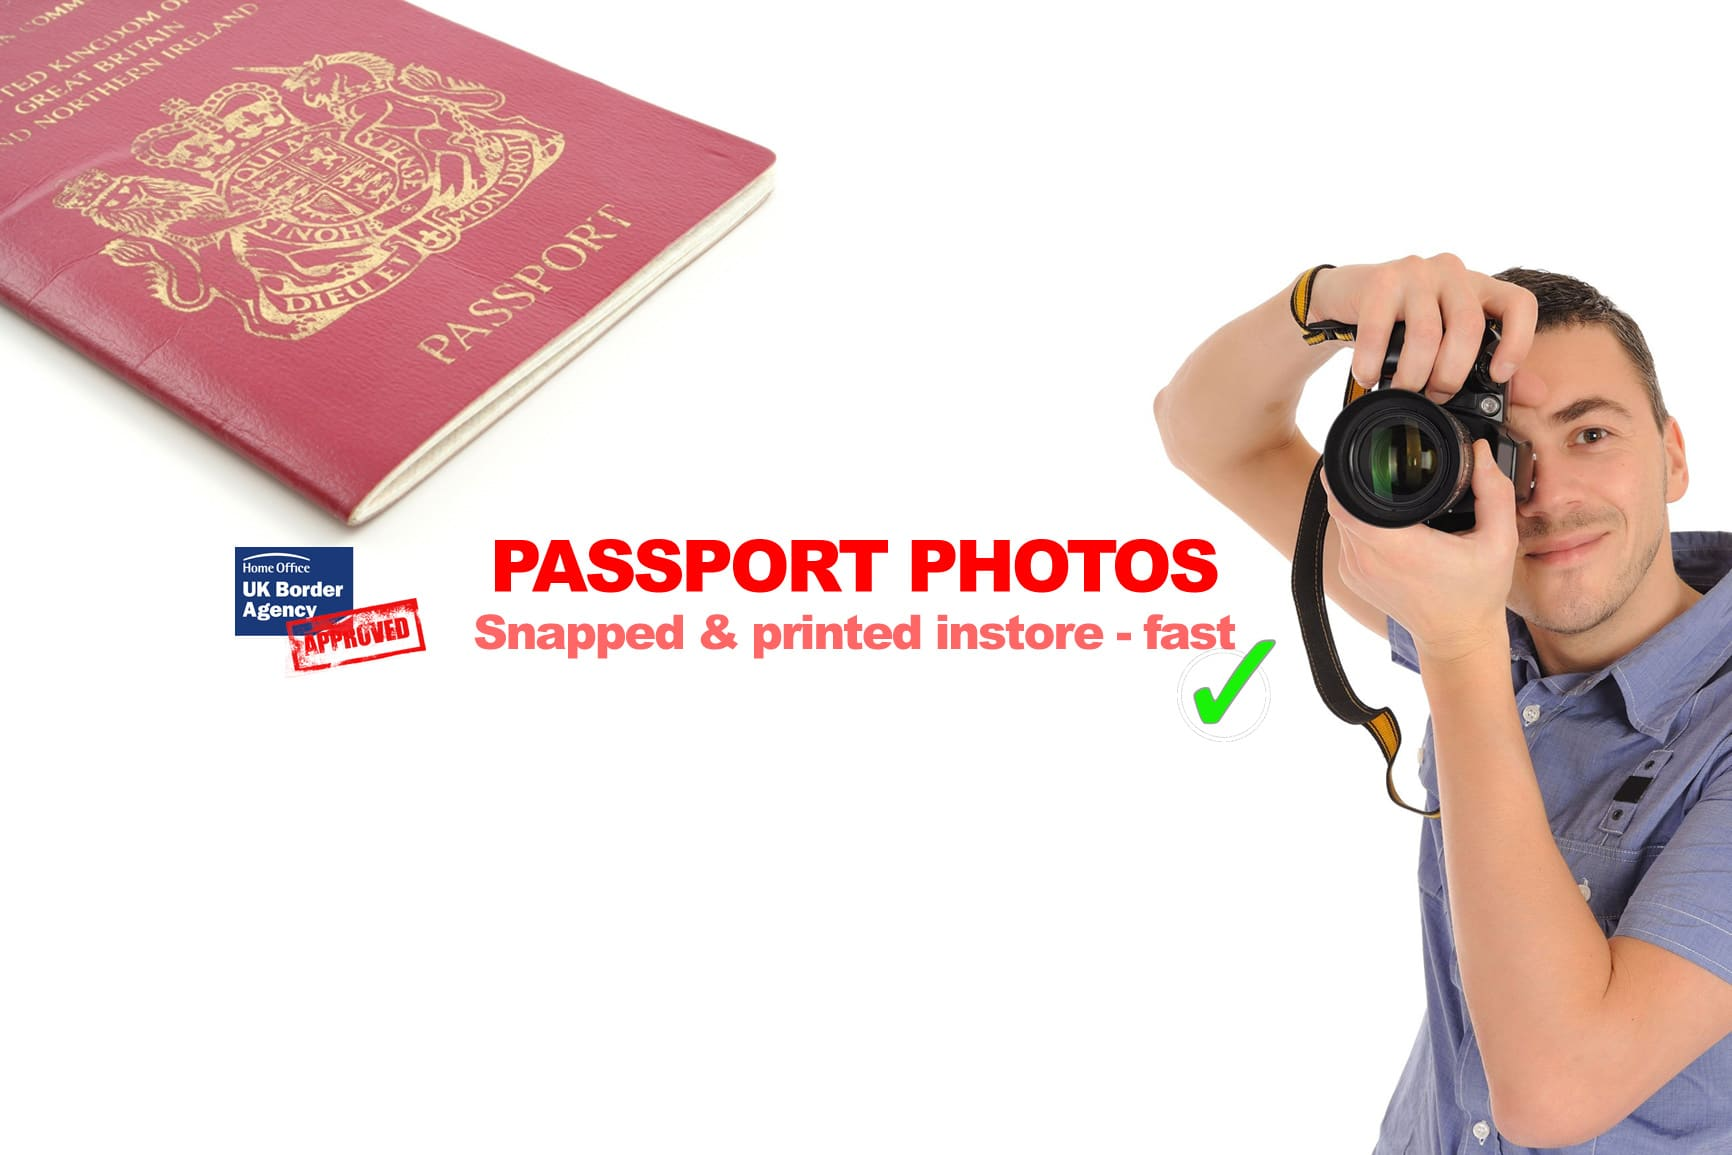 Get passport photos printed online 33 best Monster High - Wydowna Spider images on Pinterest